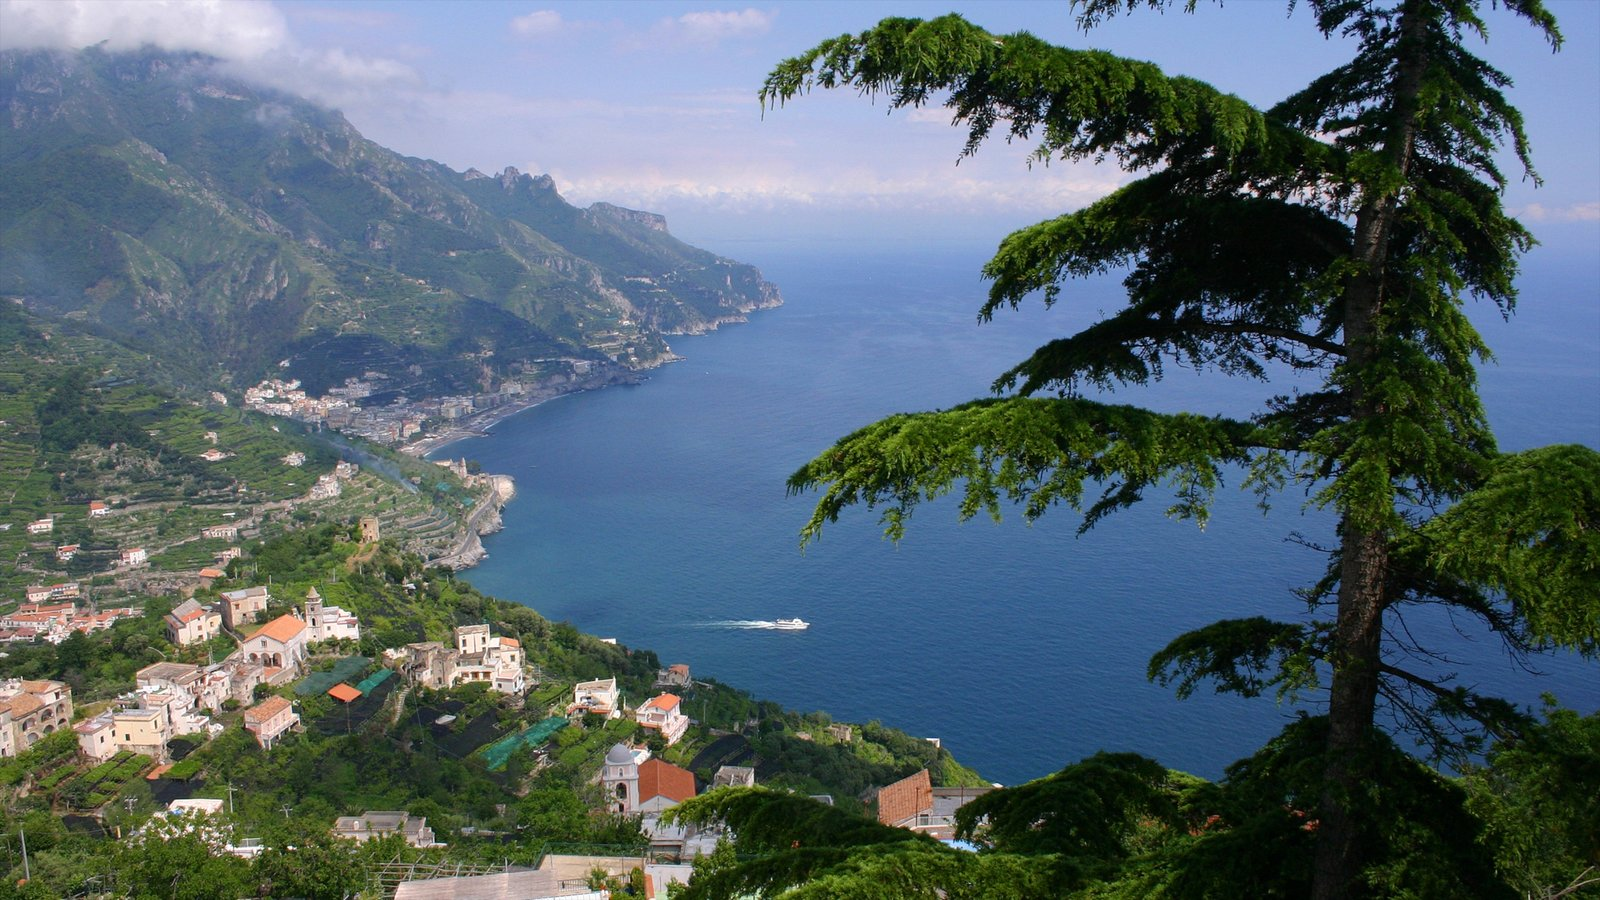 Amalfi Coast showing general coastal views, mountains and a coastal town